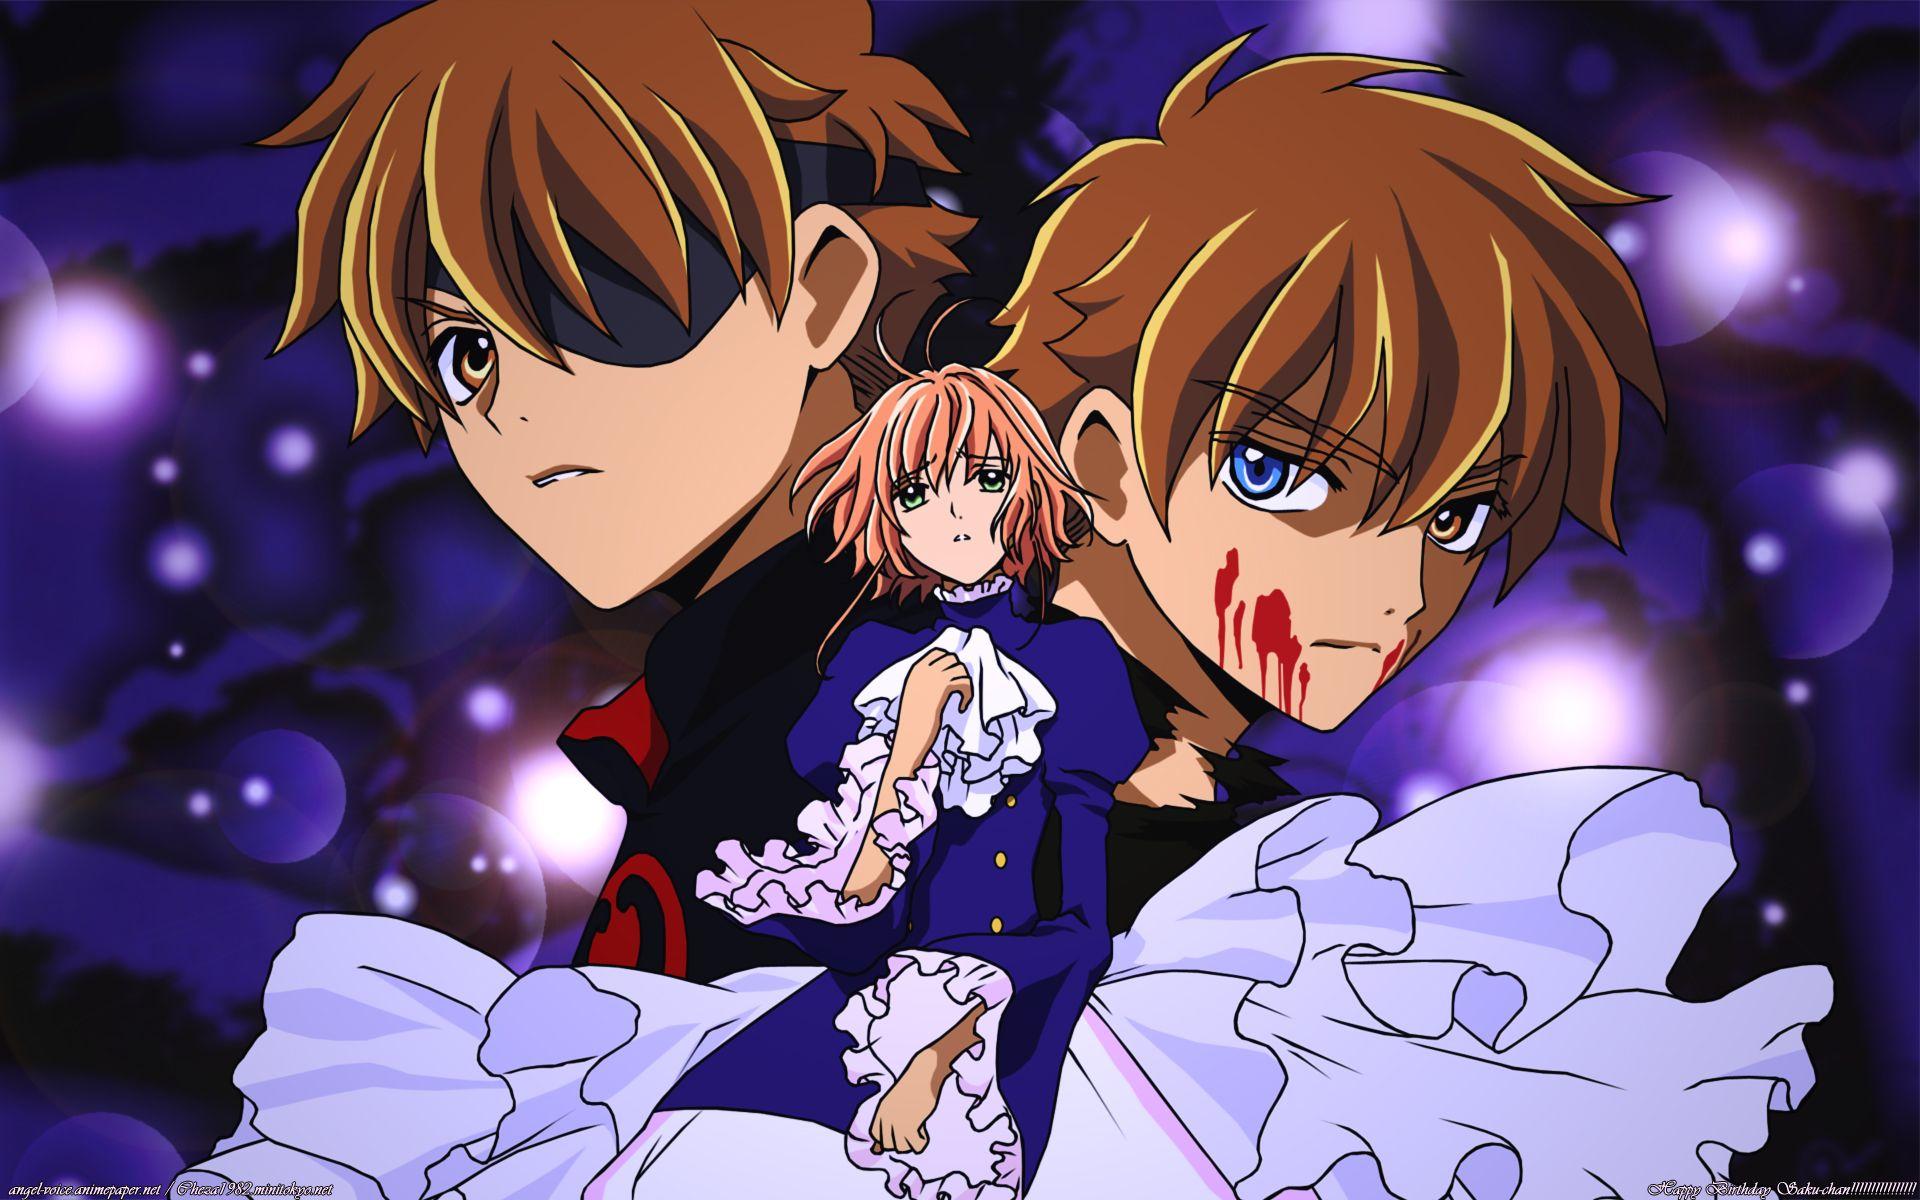 Hình ảnh trong Aaaaaanime của Sera Huff trong 2020 Anime